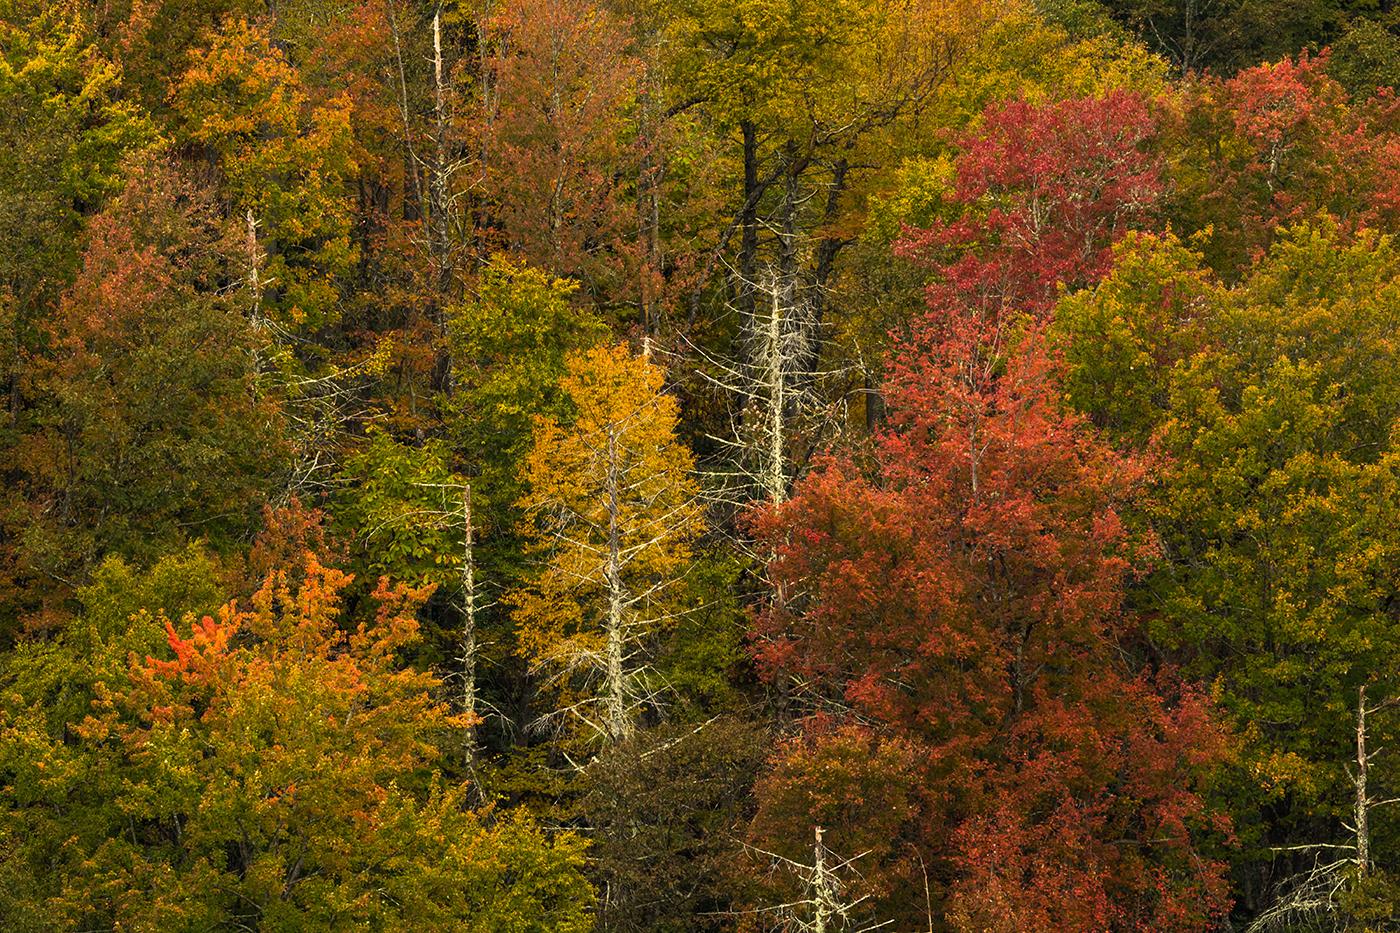 Autumn Glimpse